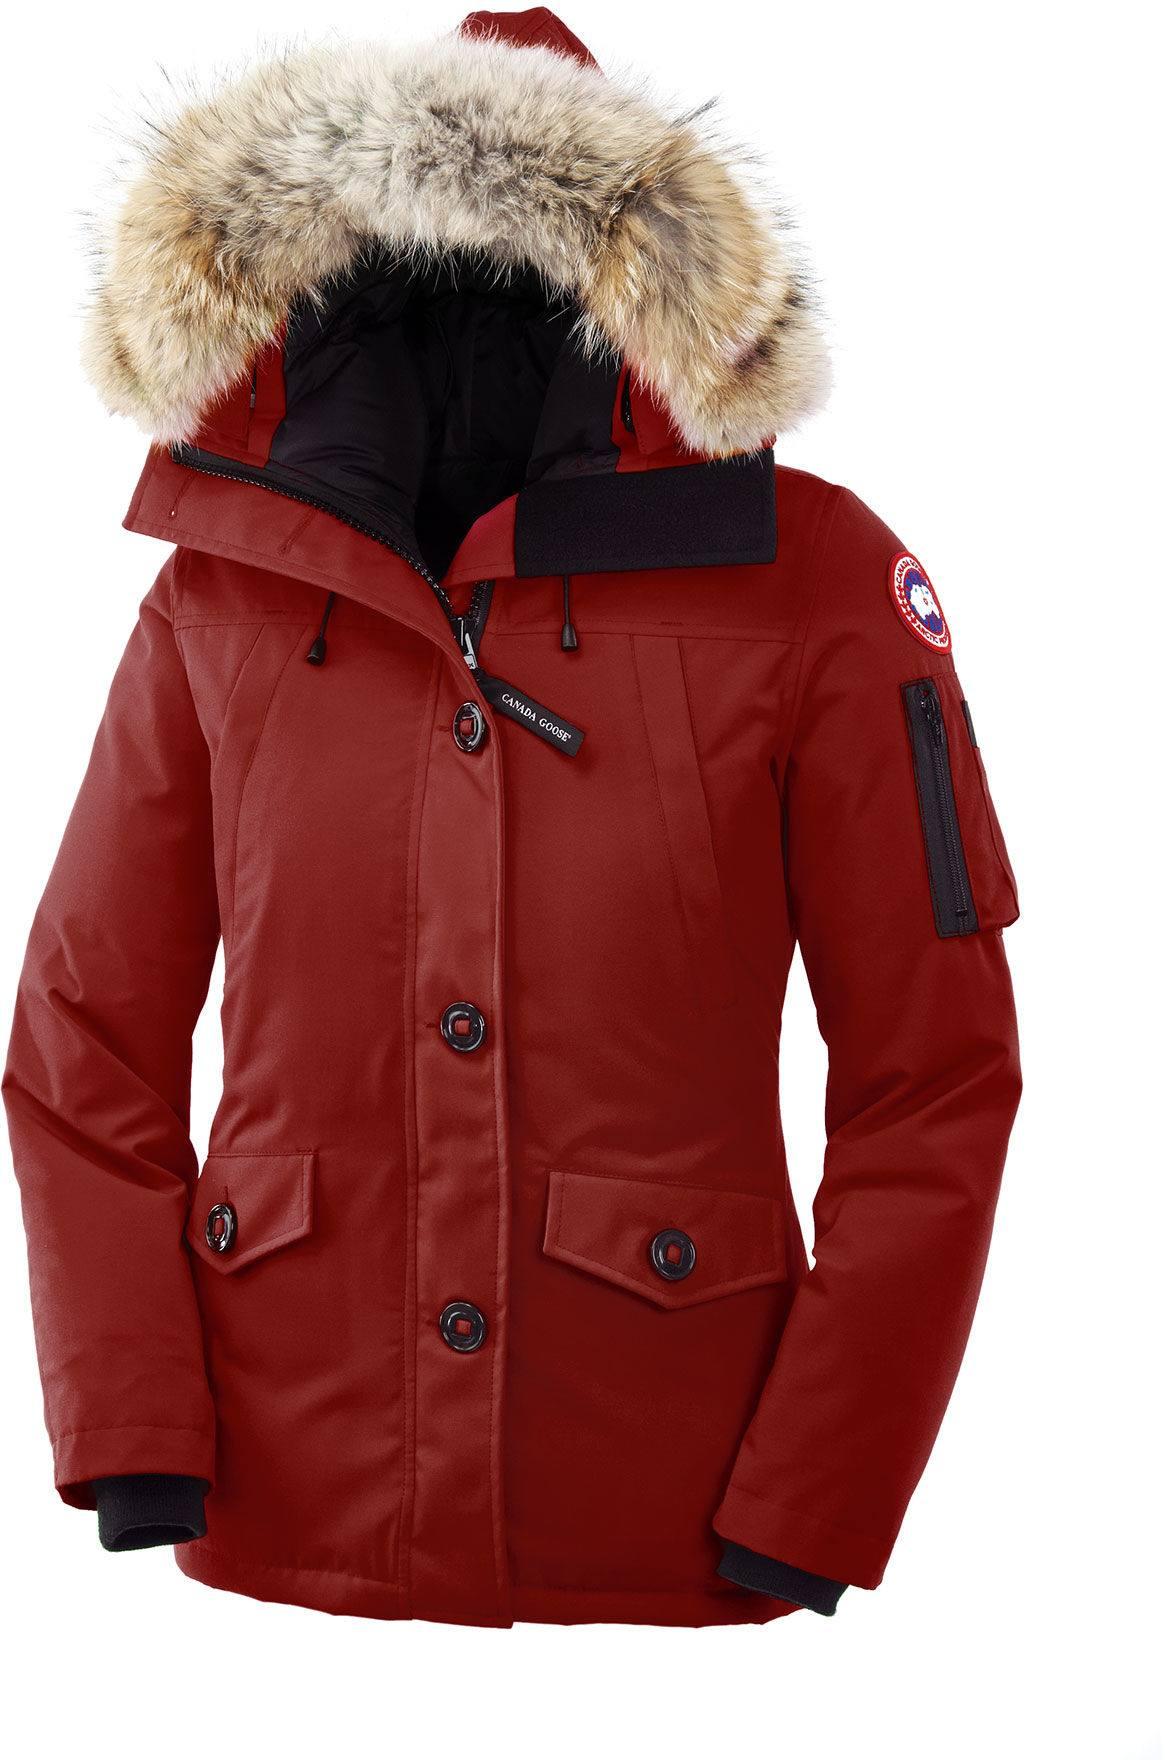 Sports Experts Canada Goose Coats Canada Goose Jackets